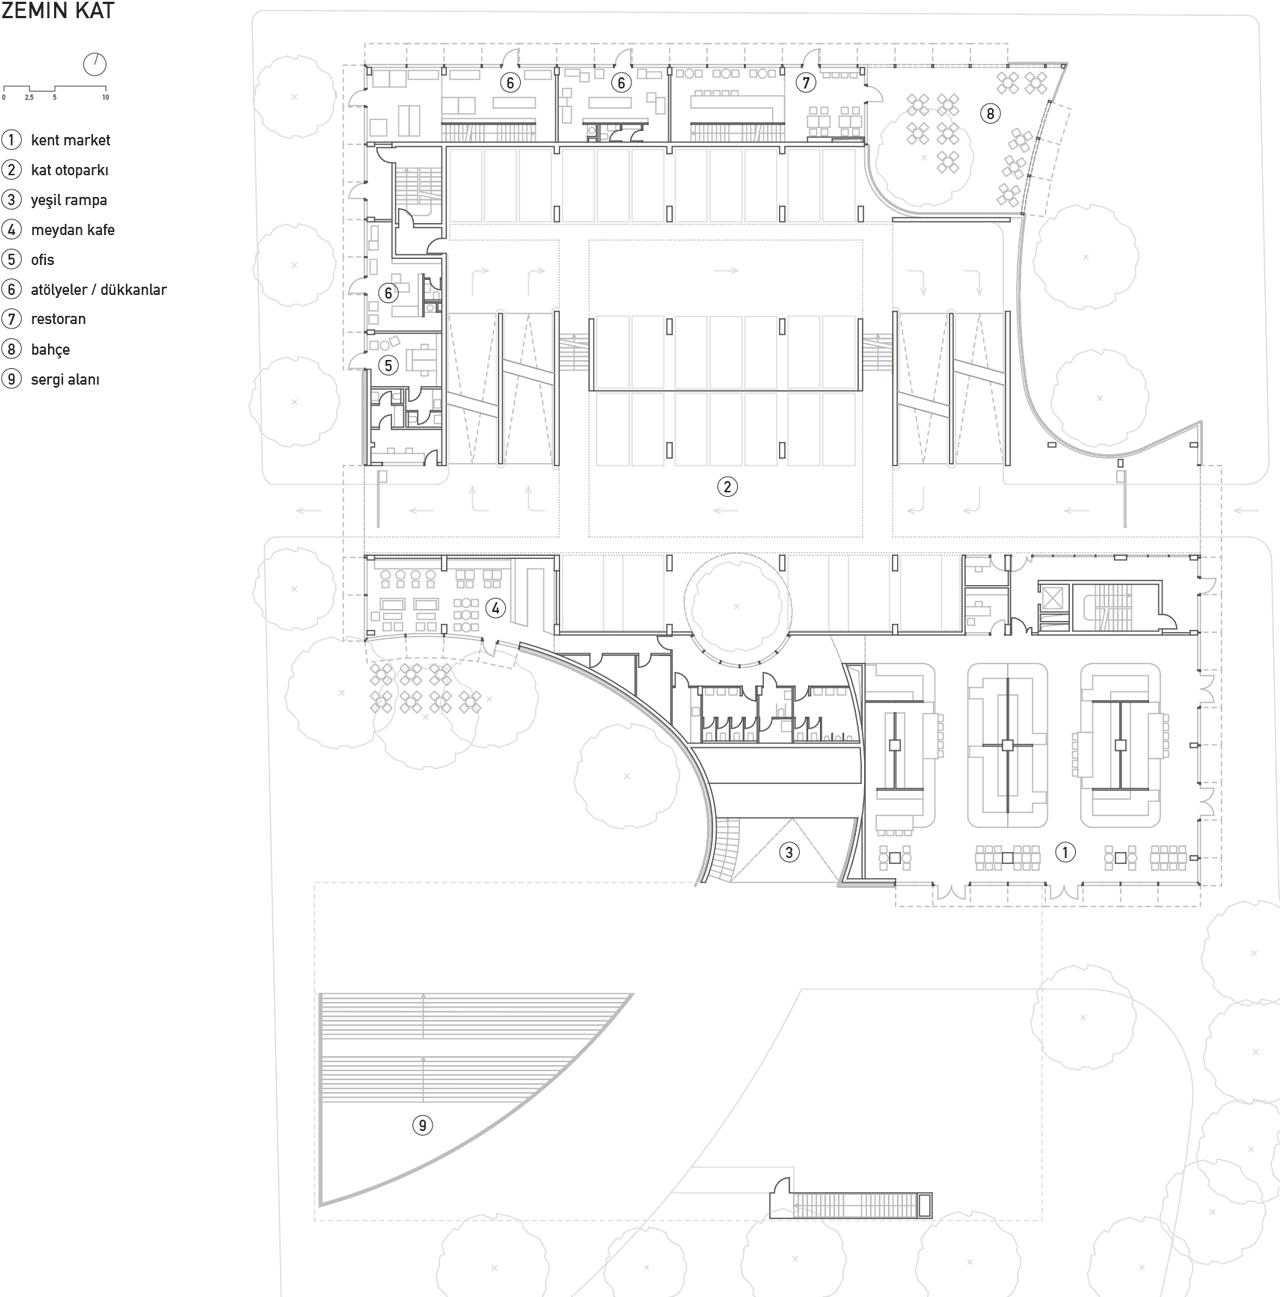 P-01_BCN_TURGUTREIS-YASAM-MERKEZI_groundfloor_tr.jpg